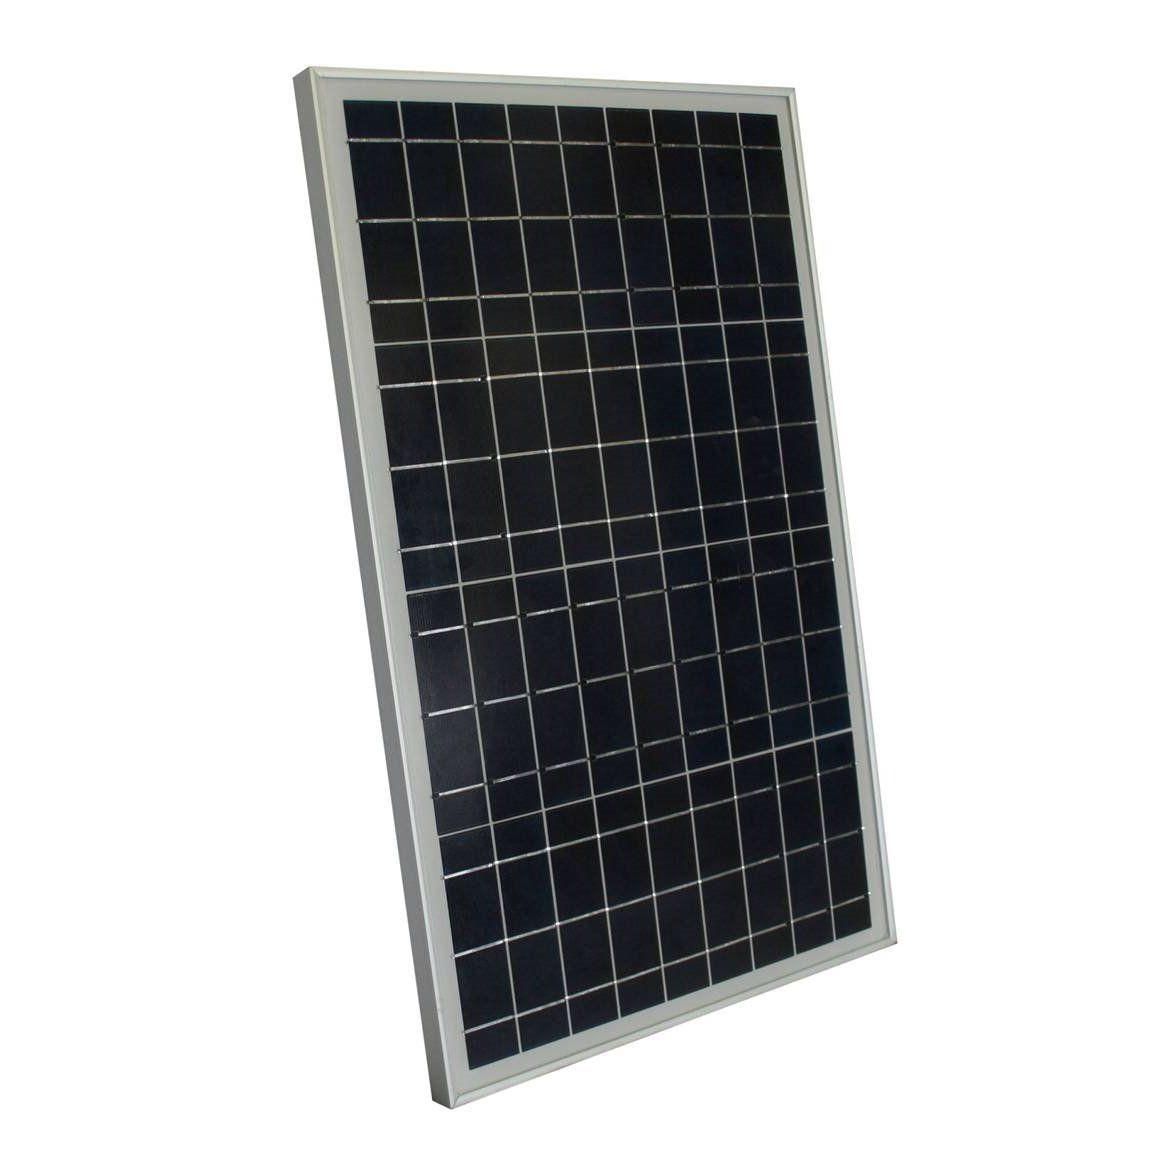 30 Watt Solar Panel 12 Volt Battery Charger For Boat Rv Back Up Off Grid Offgridliving